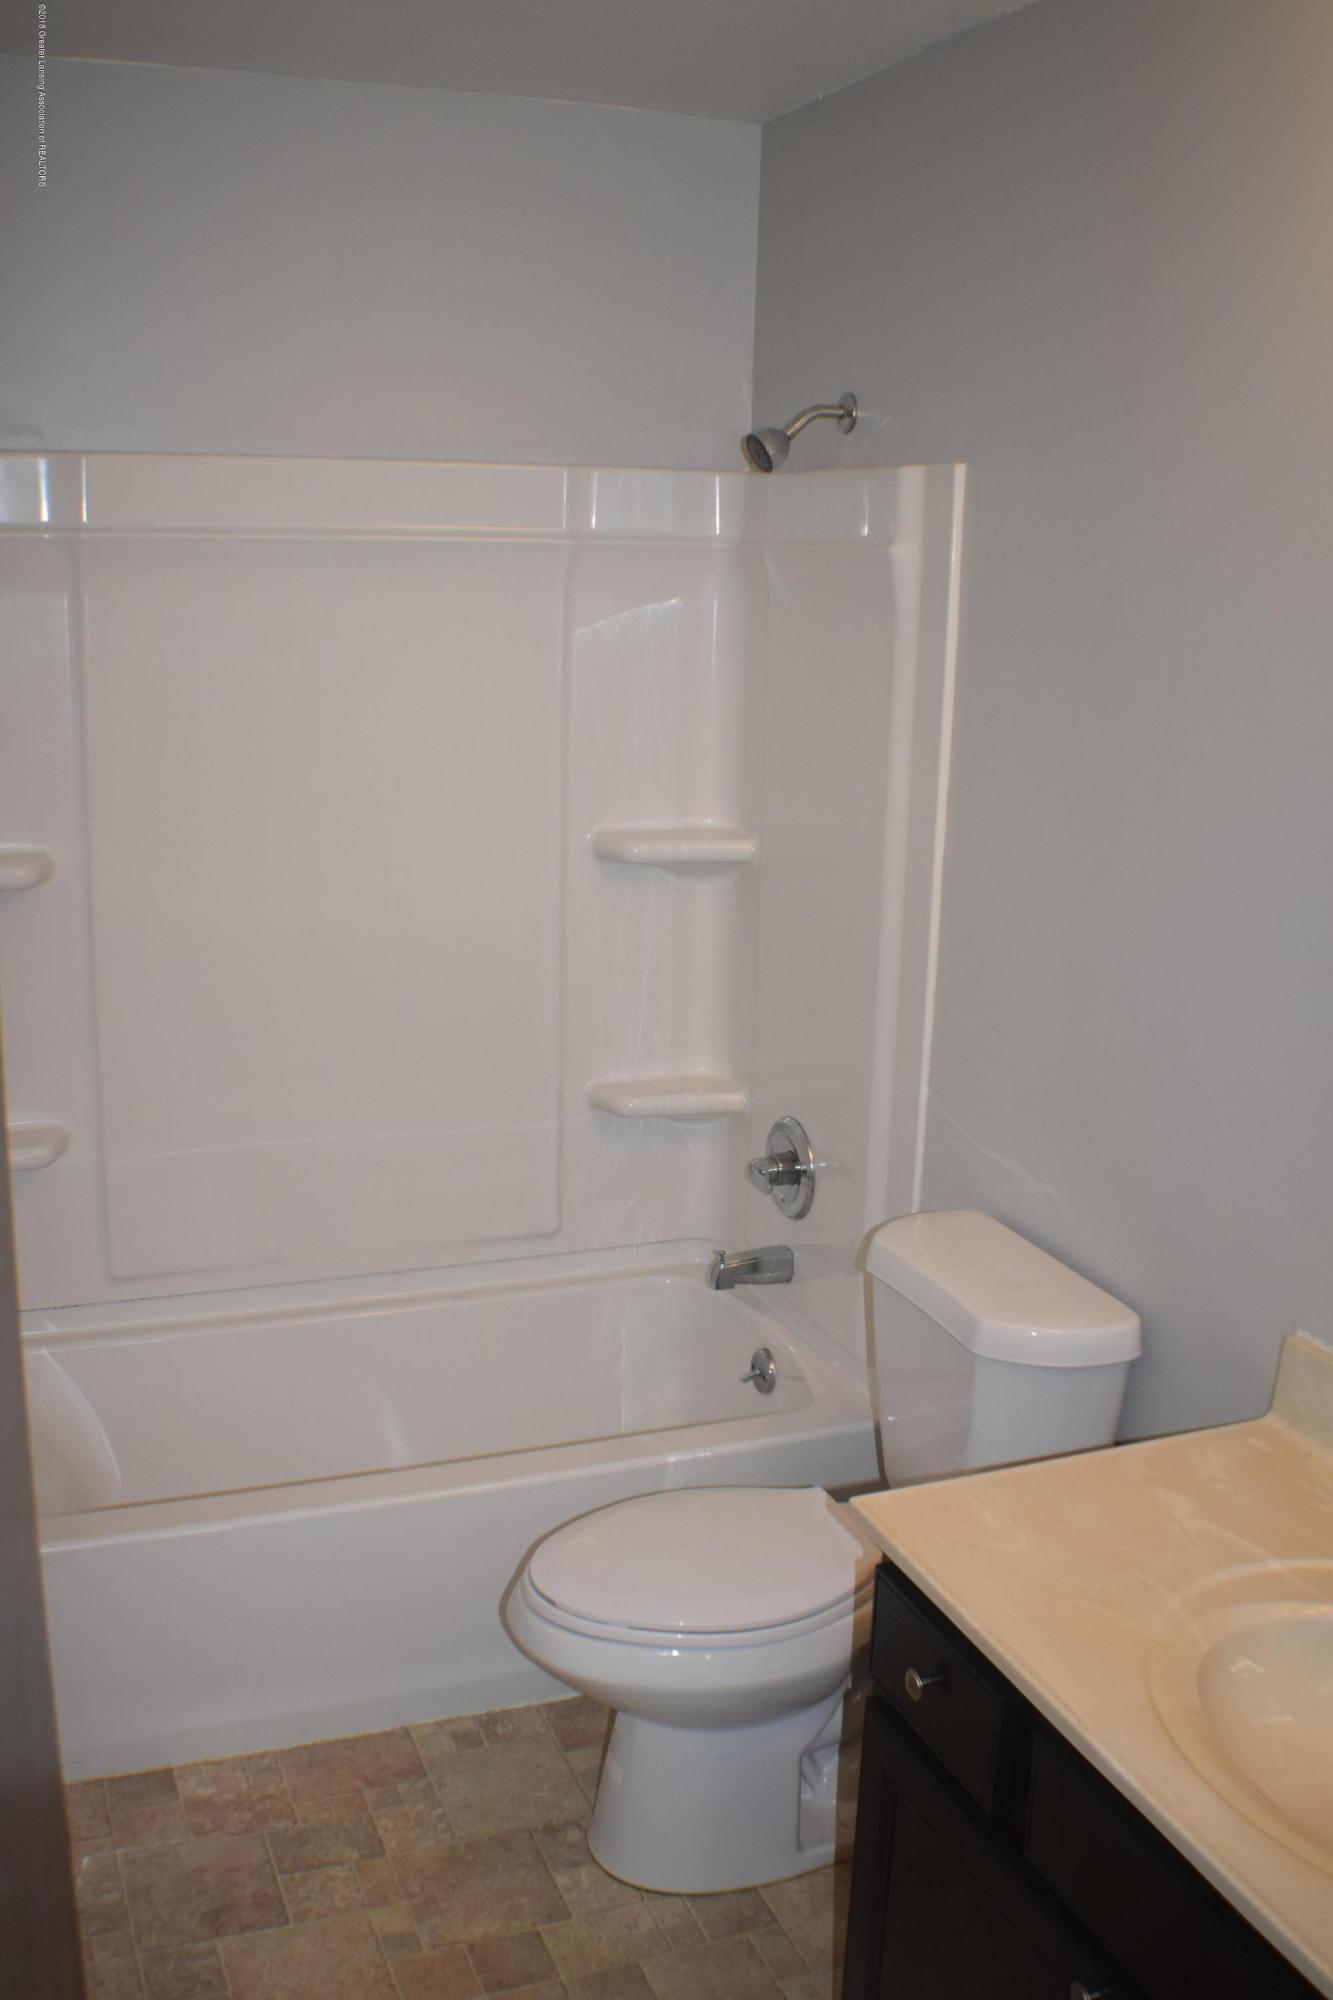 3900 Lauderhill Cir - Bathroom - 8